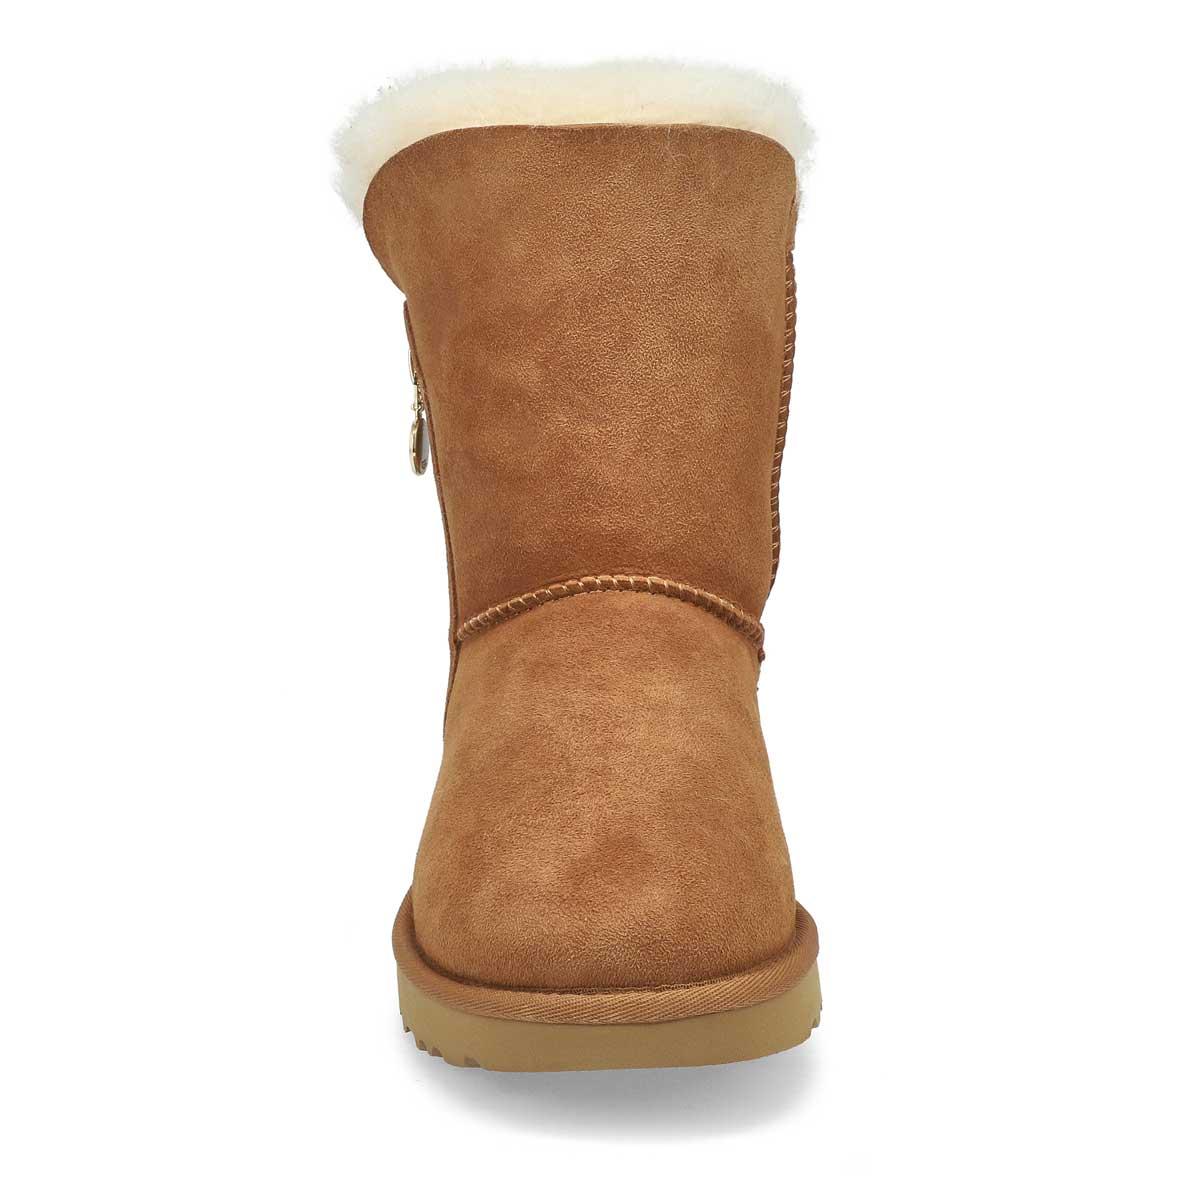 Lds Bailey Zip Short chesnut boot